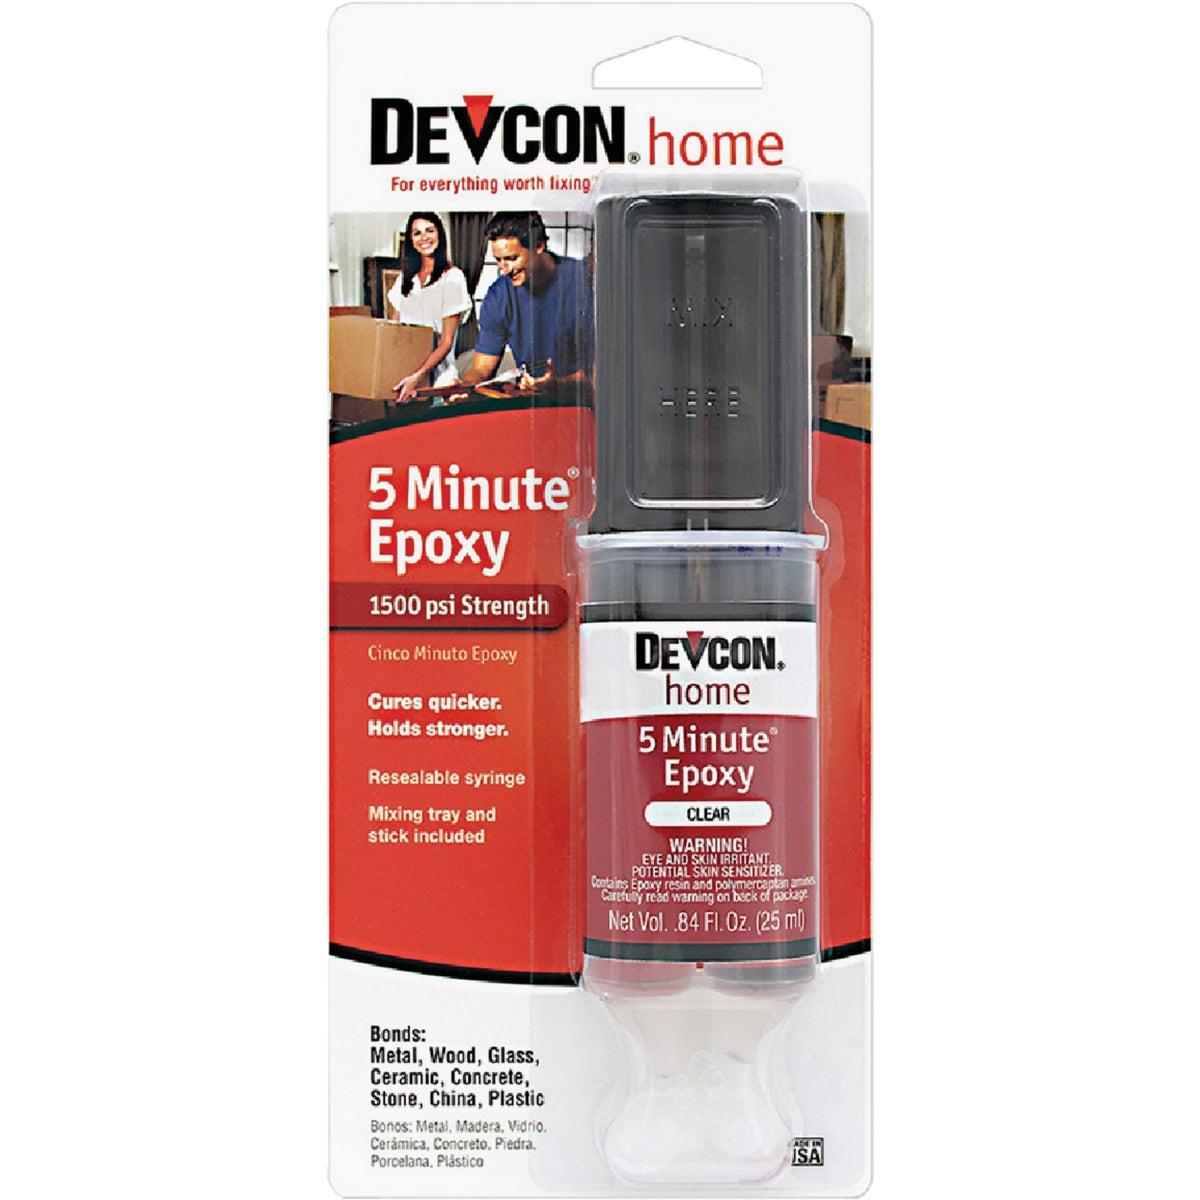 ITW Consumer/ Devcon 1OZ 5-MIN EPOXY SYRINGE S-208